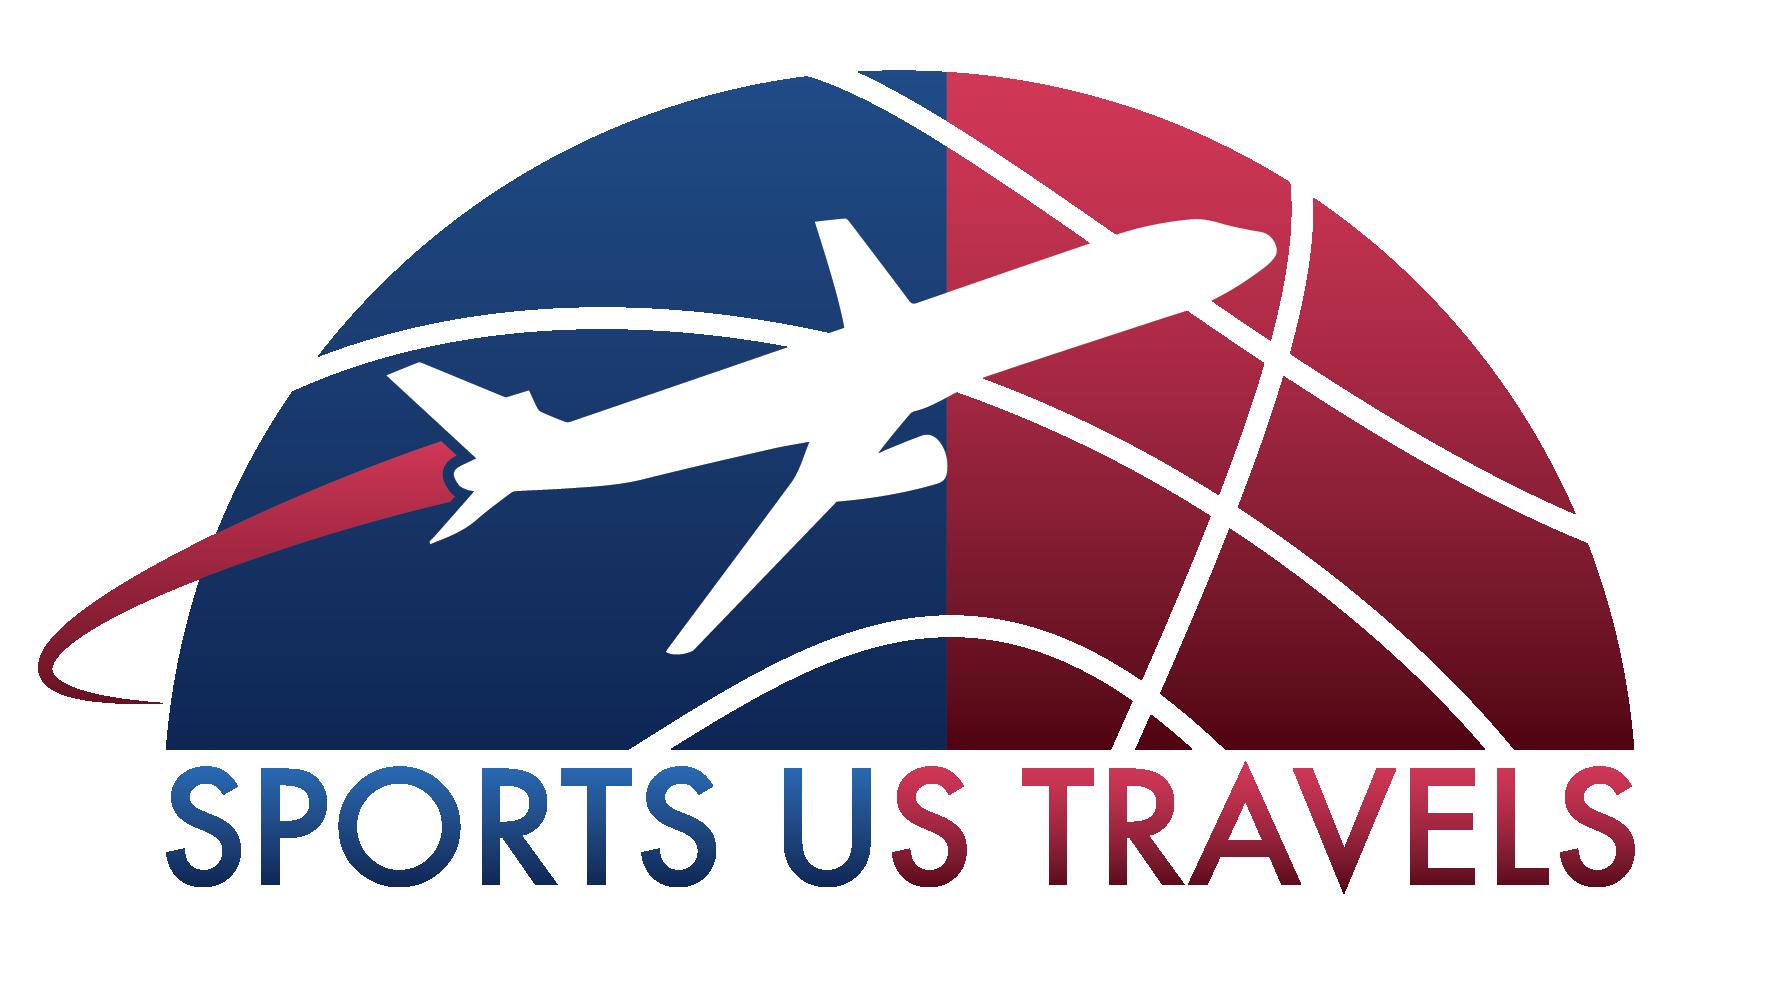 Sports Us Travels